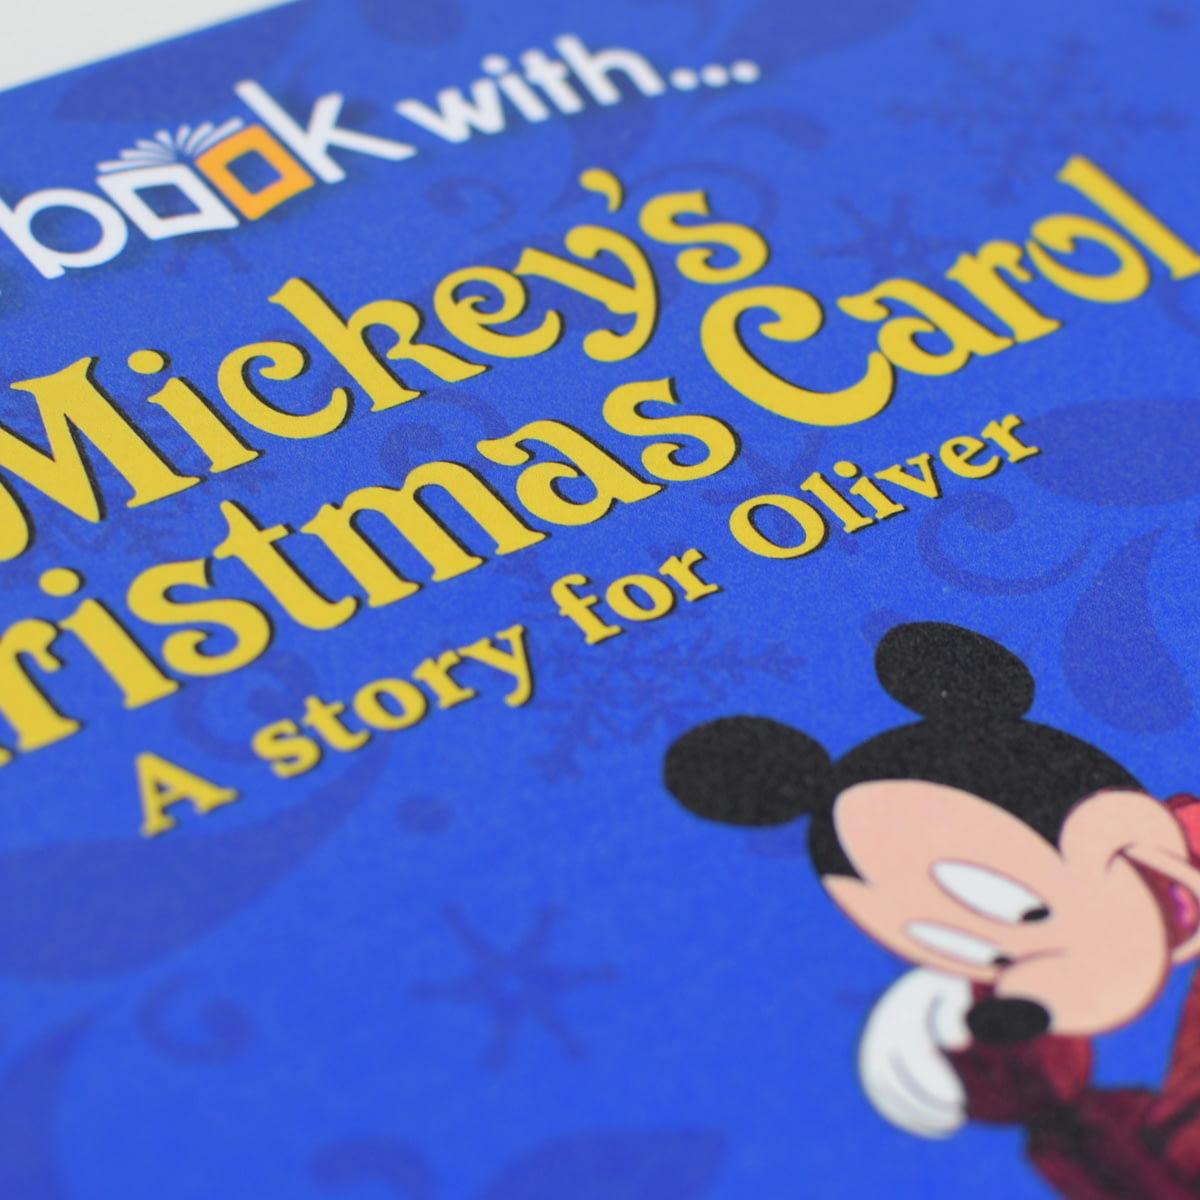 Mickeys Christmas Carol Book.Personalised Disney S Mickey S Christmas Carol Story Book